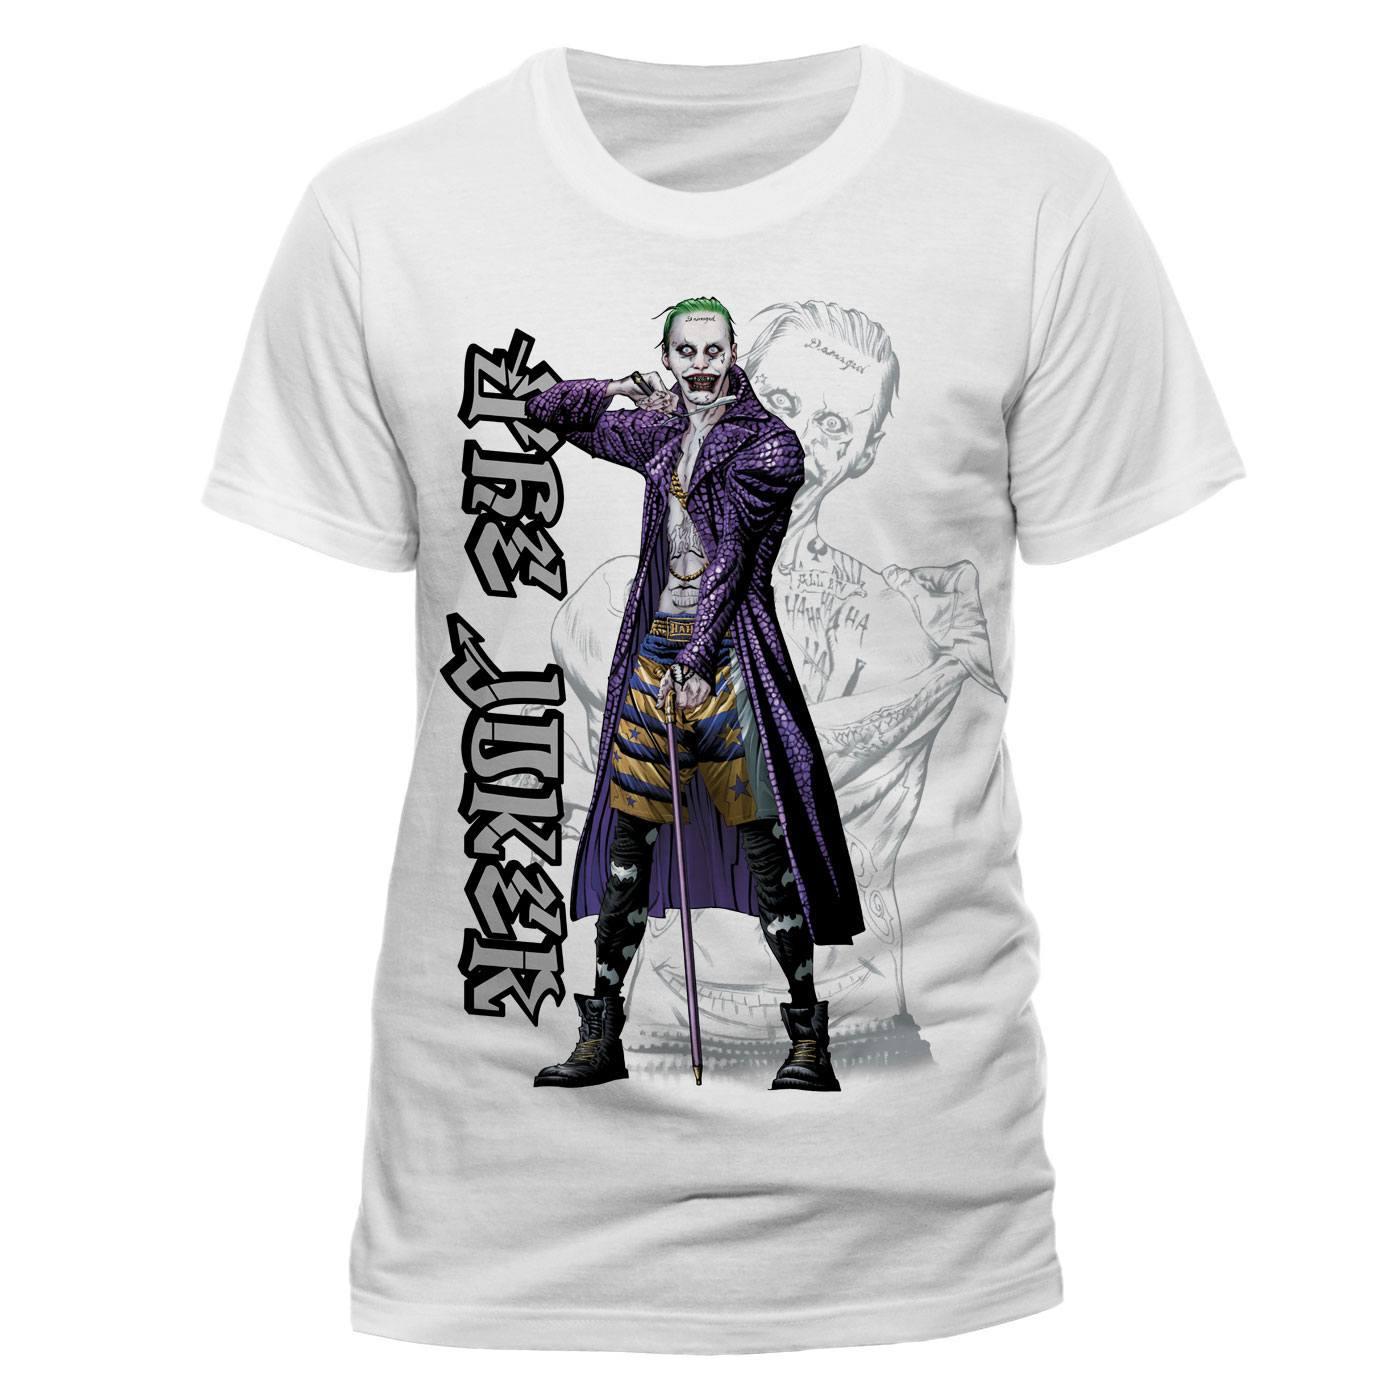 Suicide Squad T-Shirt Cartoon Joker Size XL